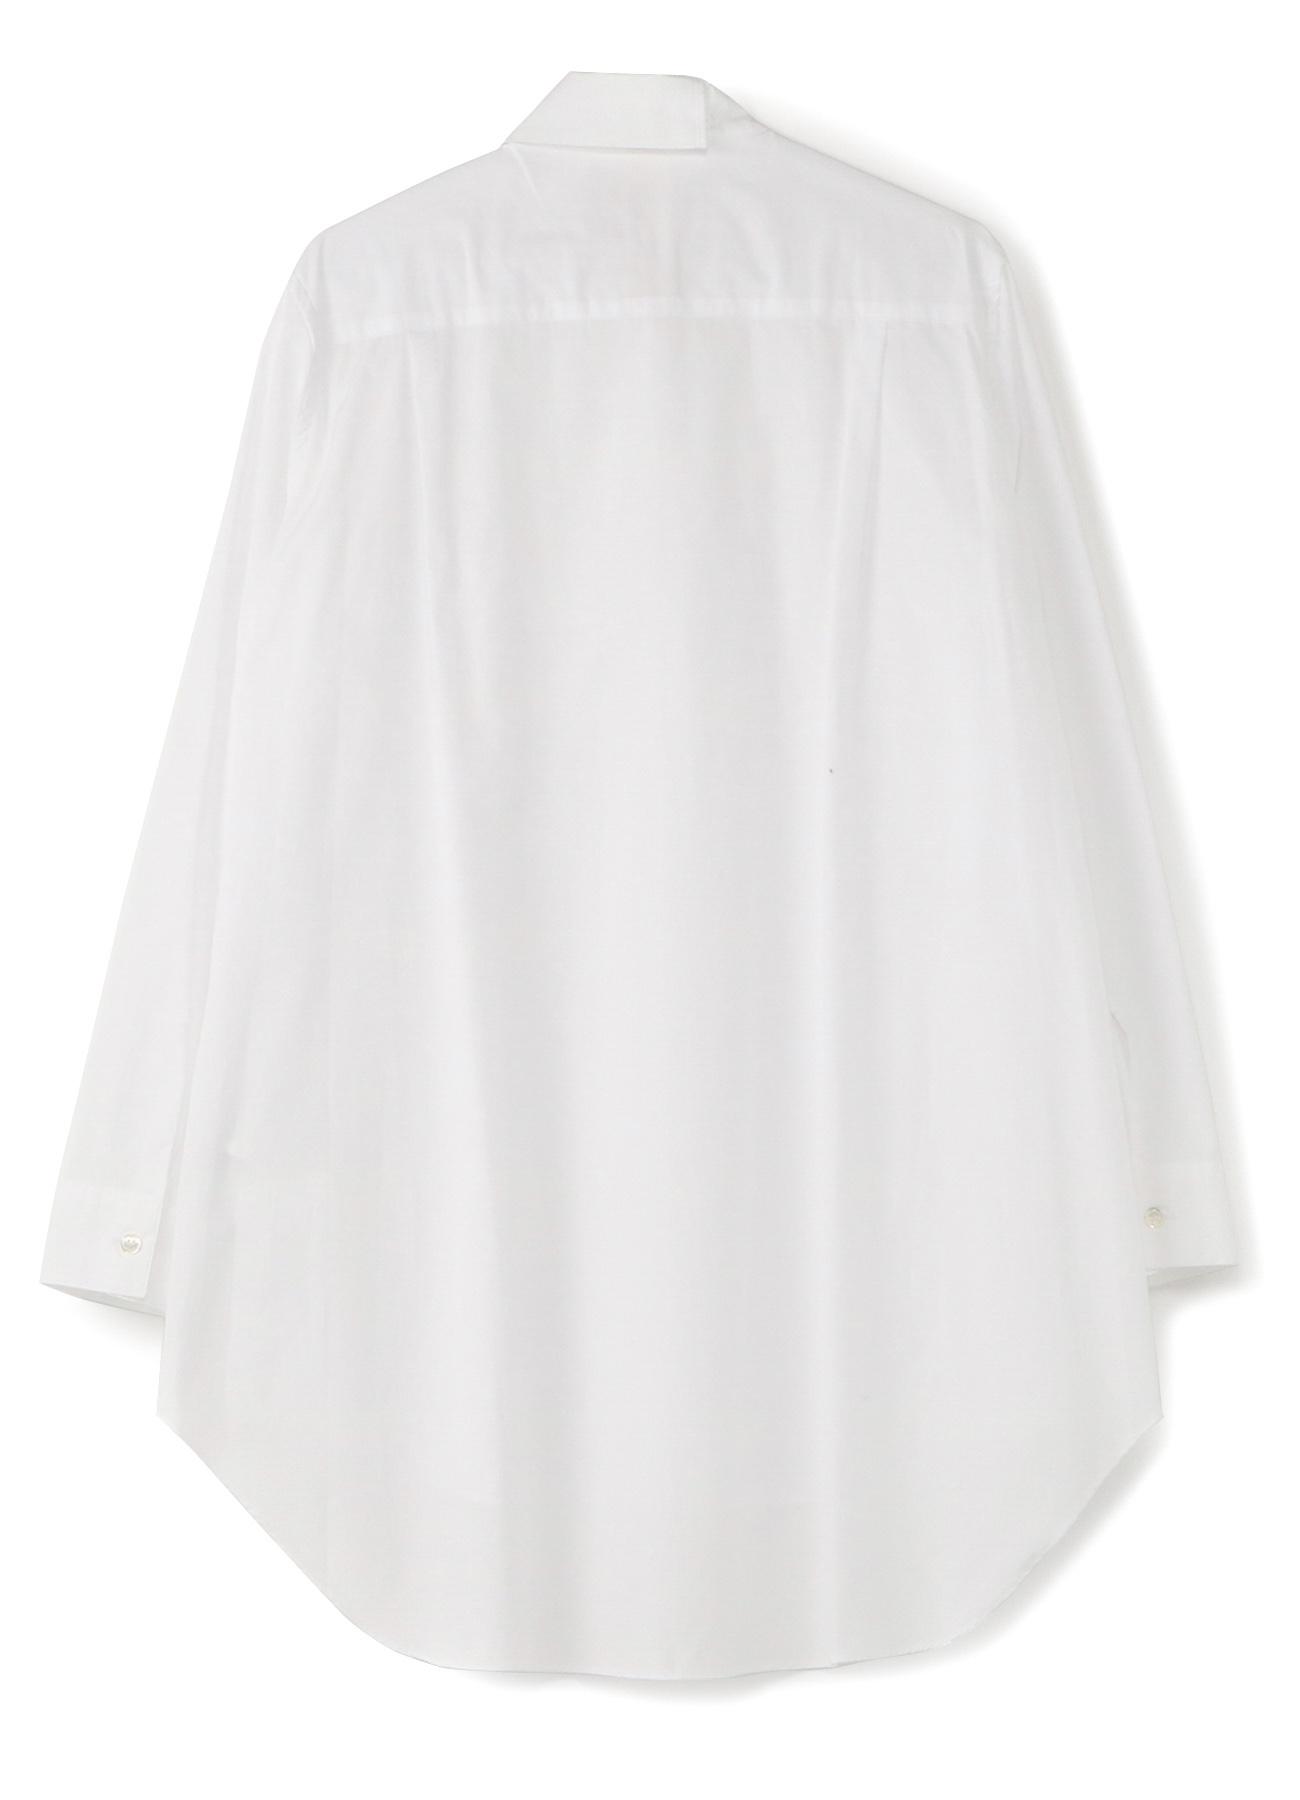 100/2 cotton broad Cut off Collar Shirt